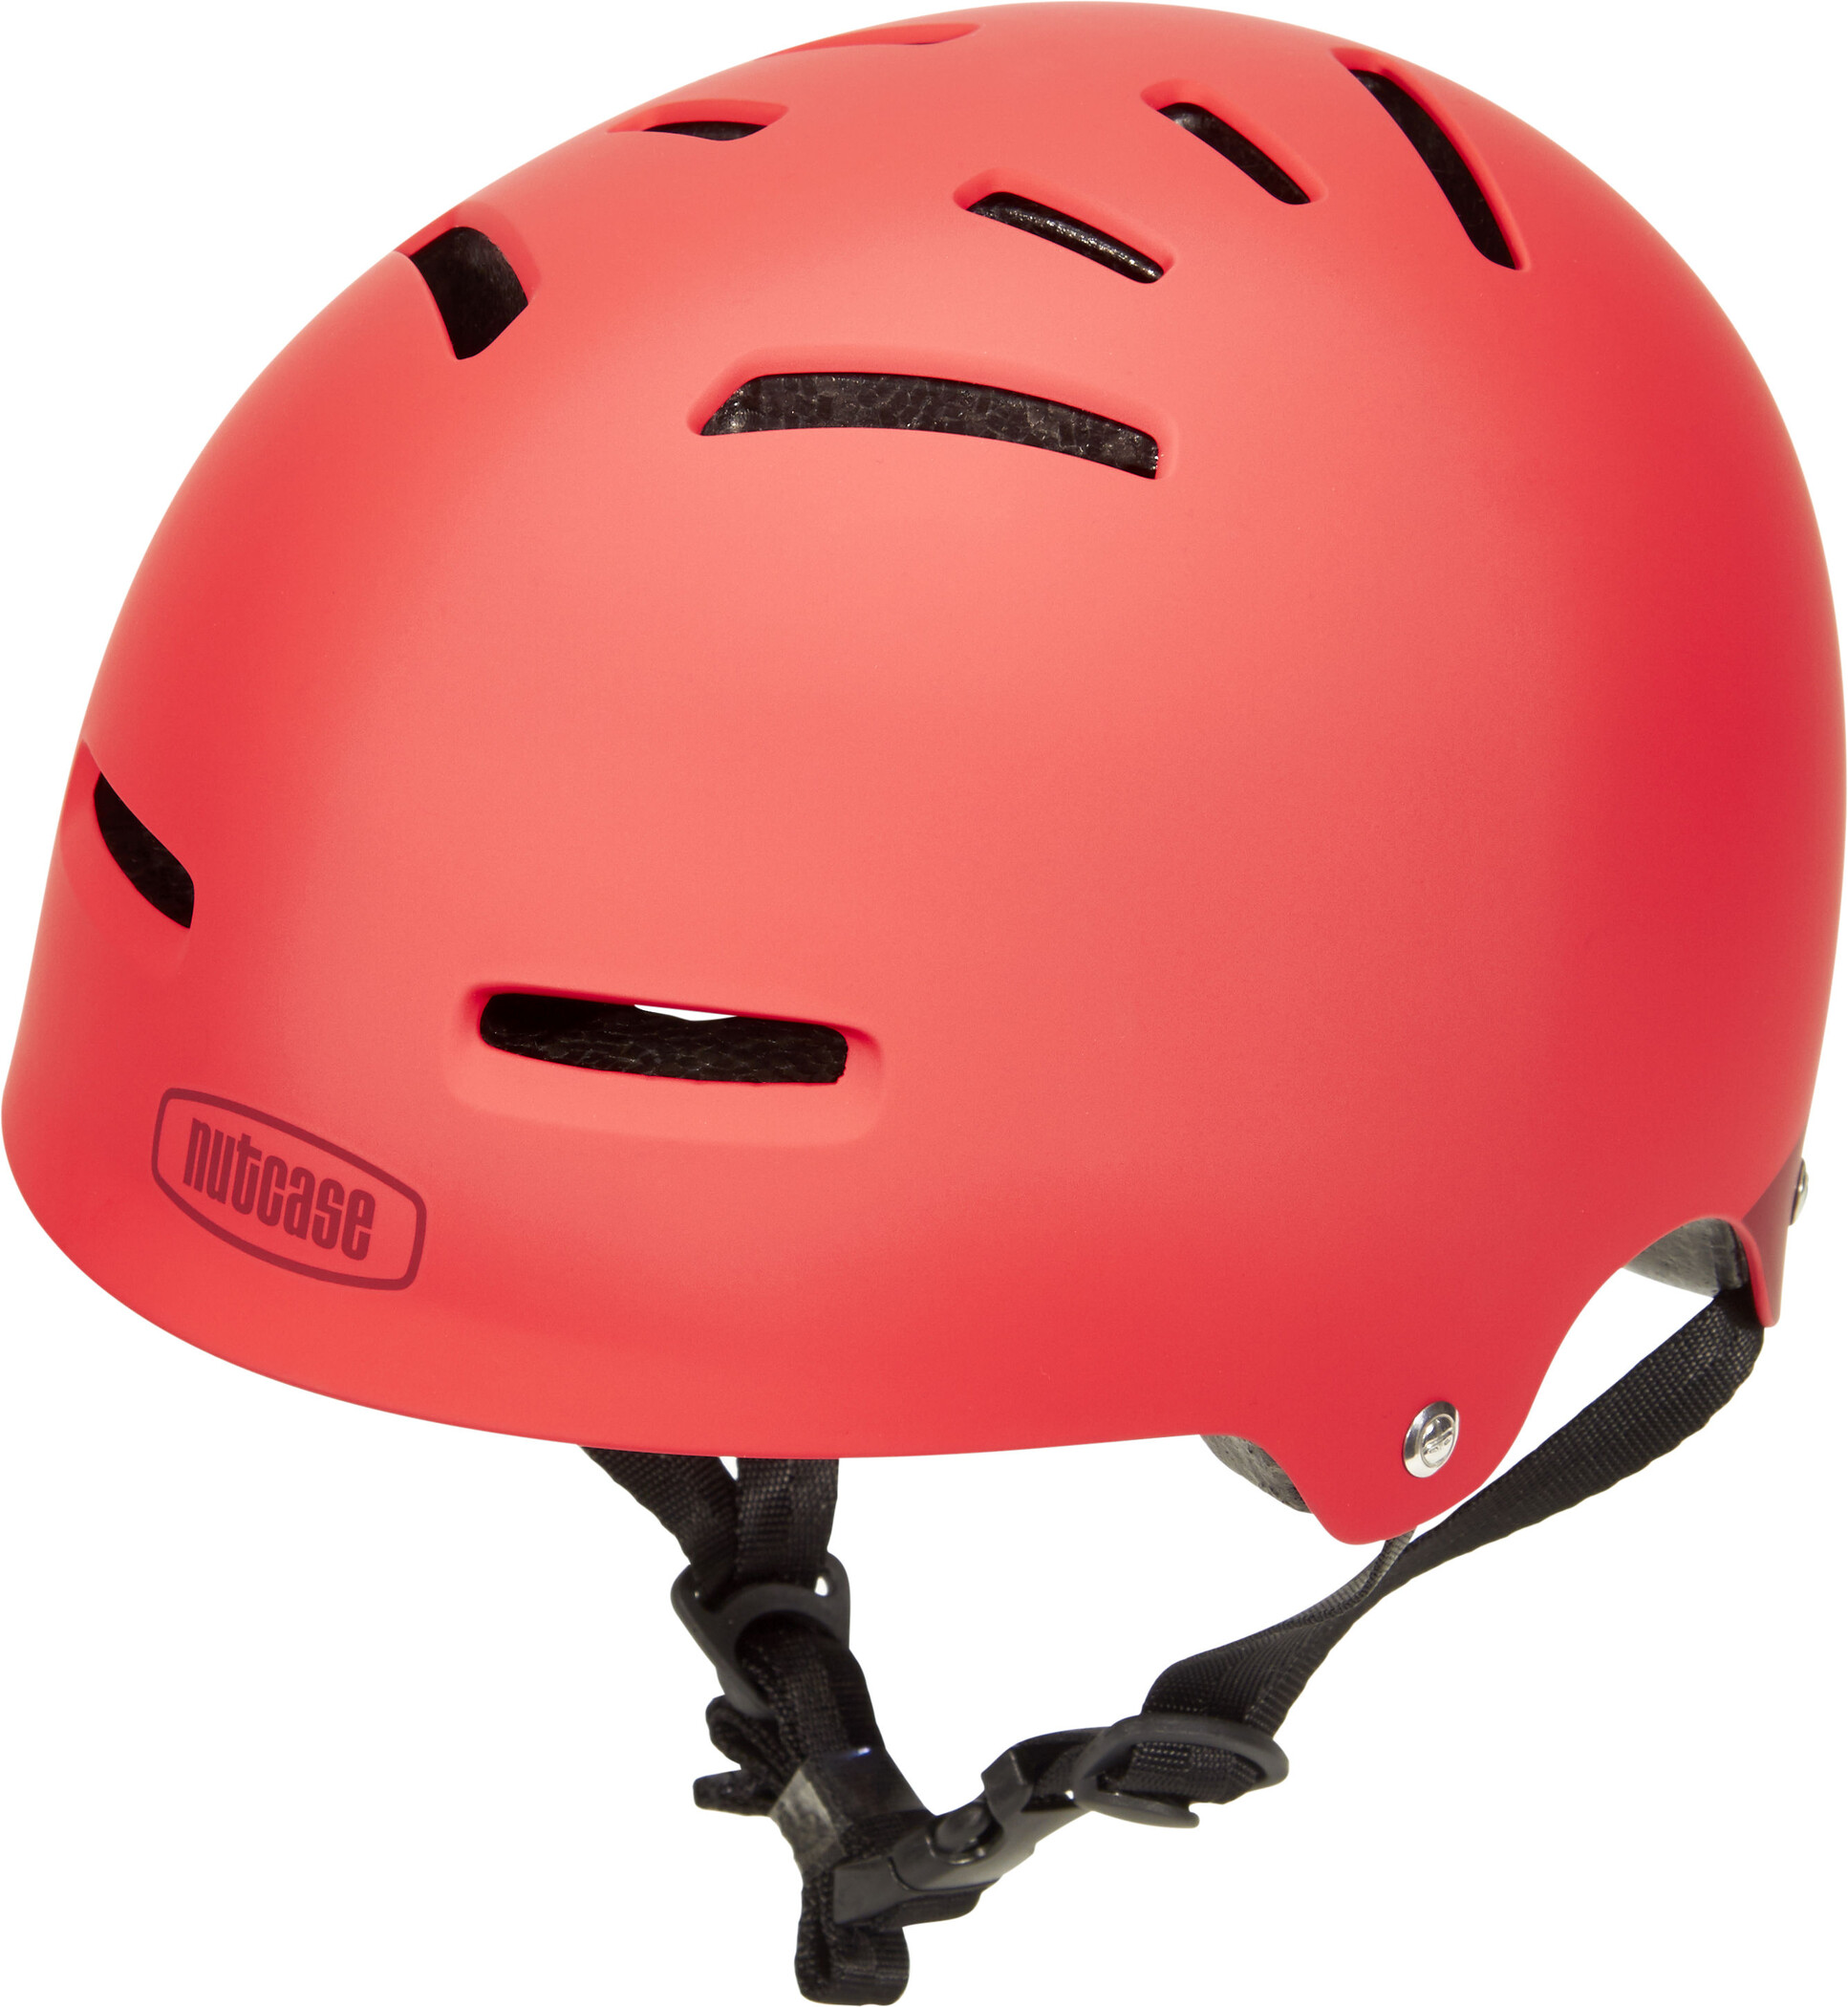 Nutcase Red Zone Cykelhjelm | Helmets